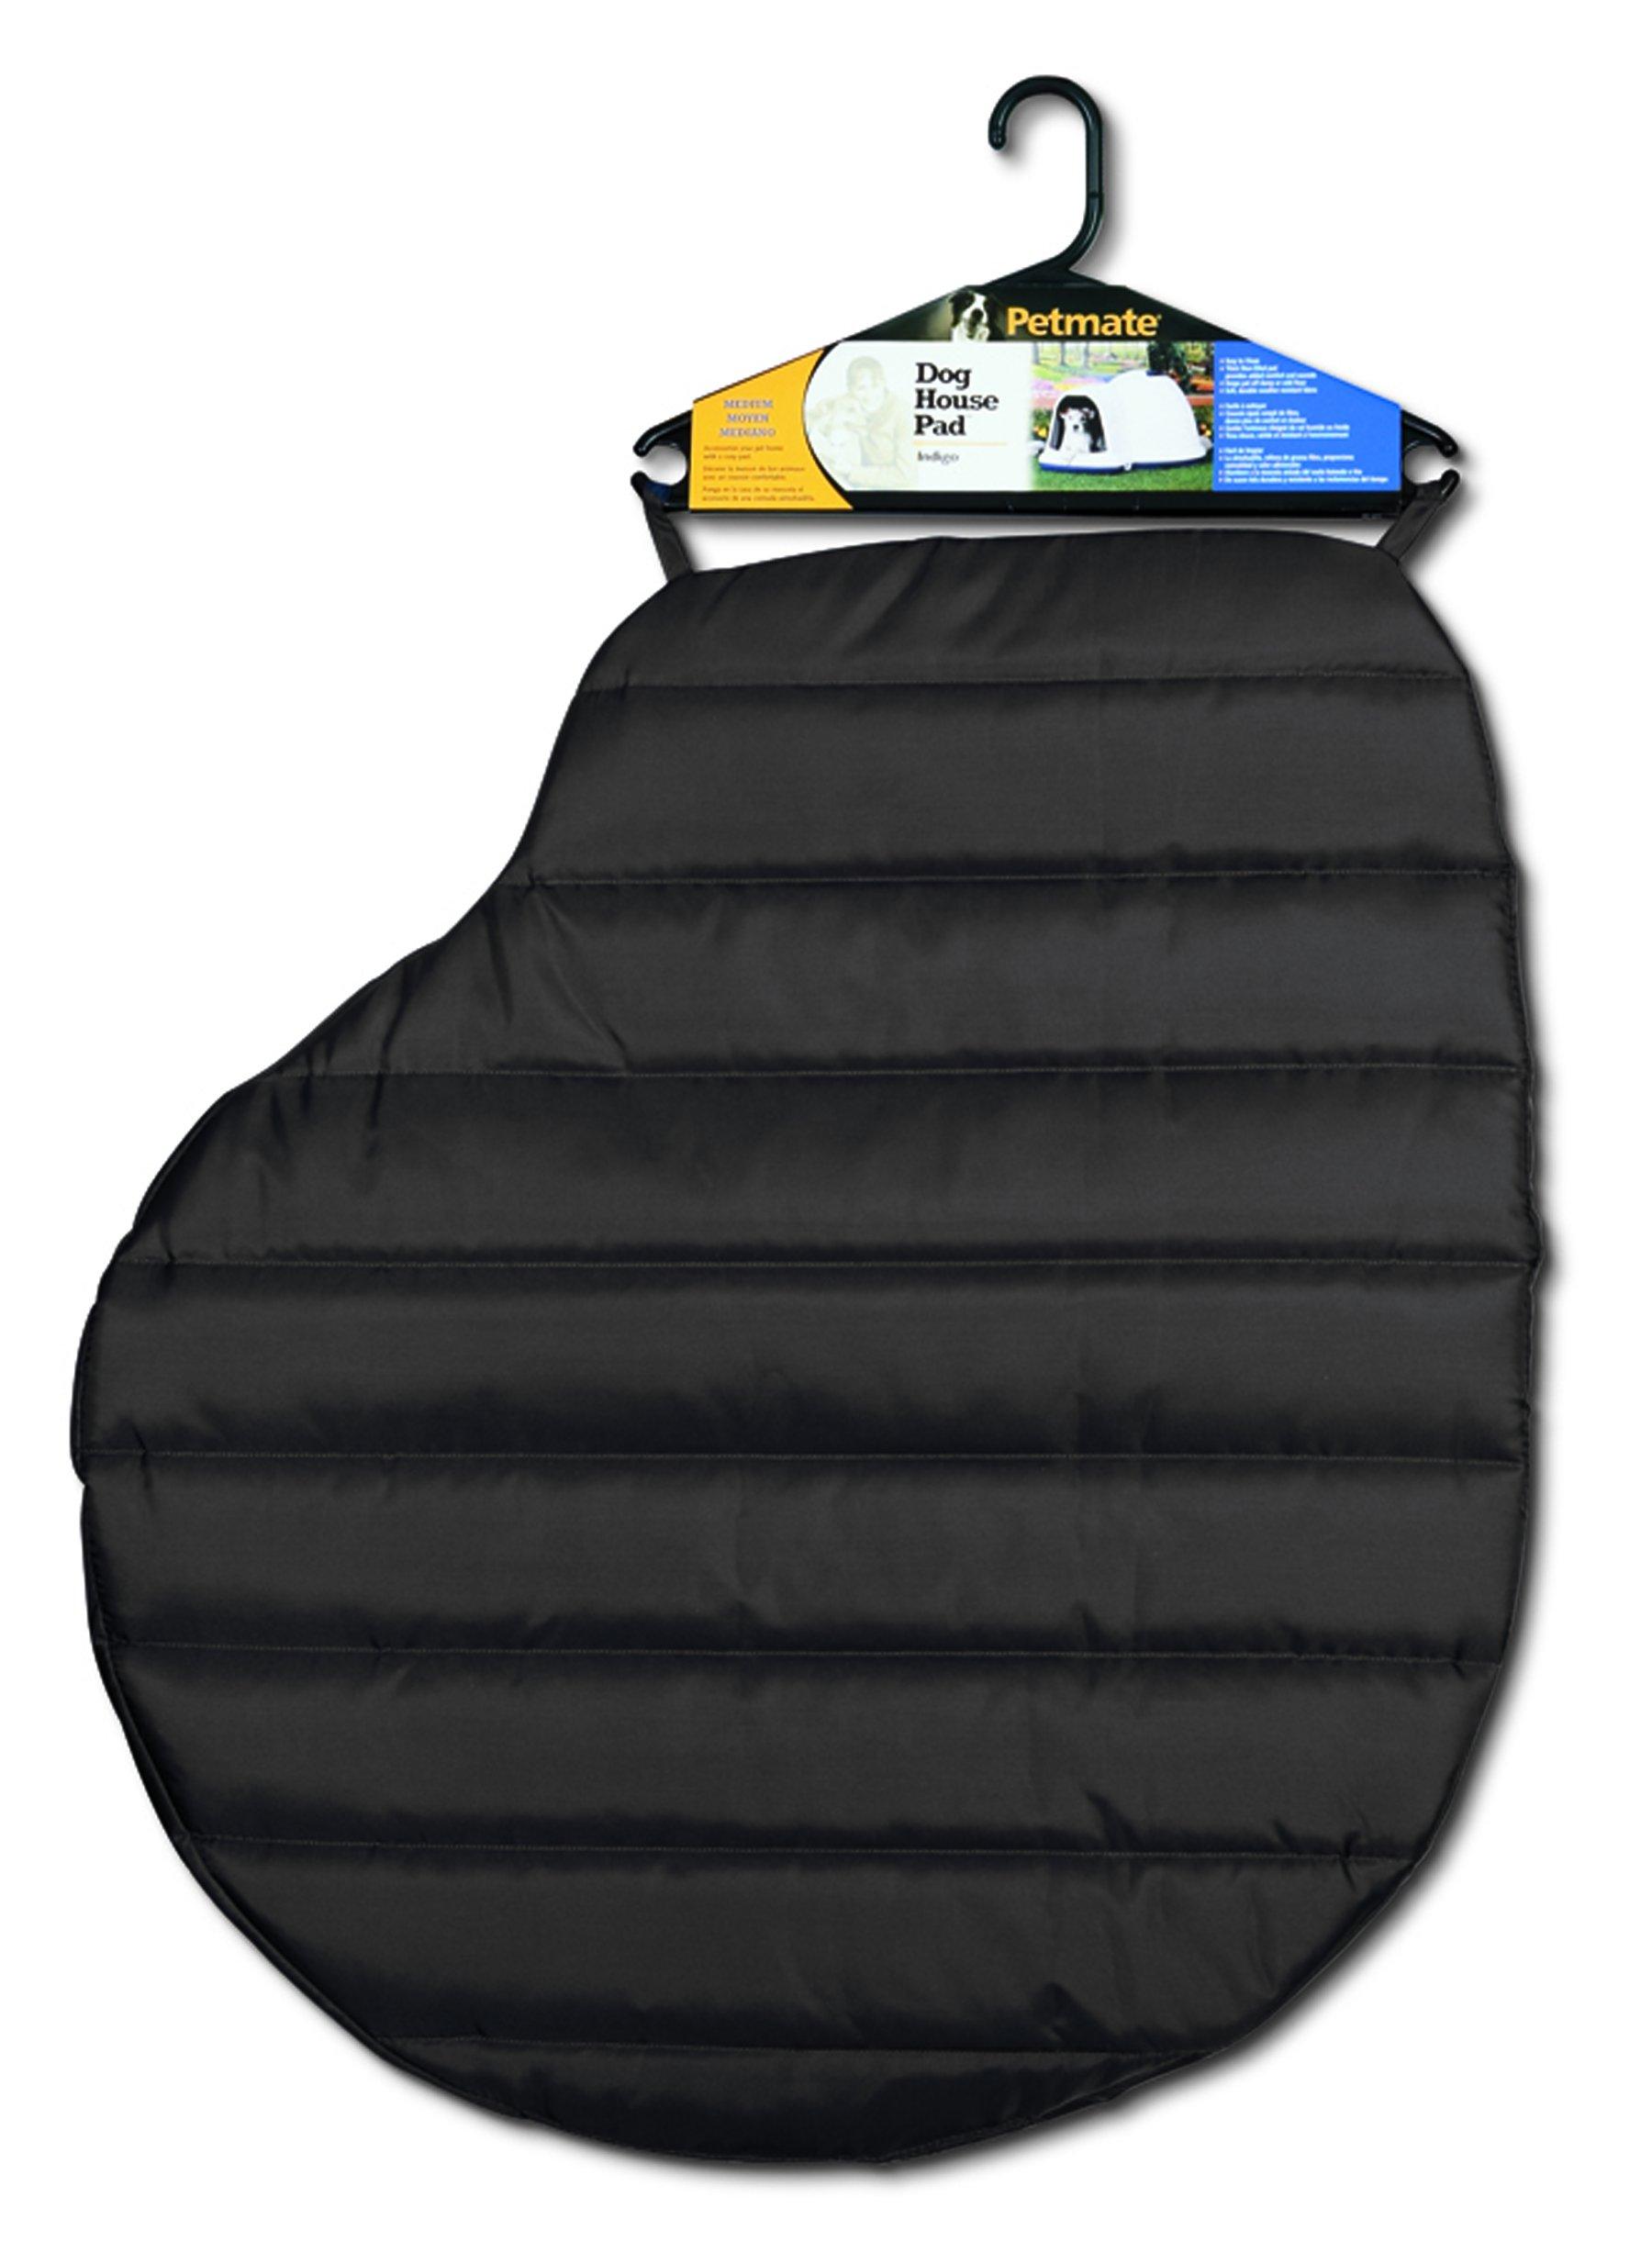 Quilted Nylon Pad Indigo 90-125Lbs